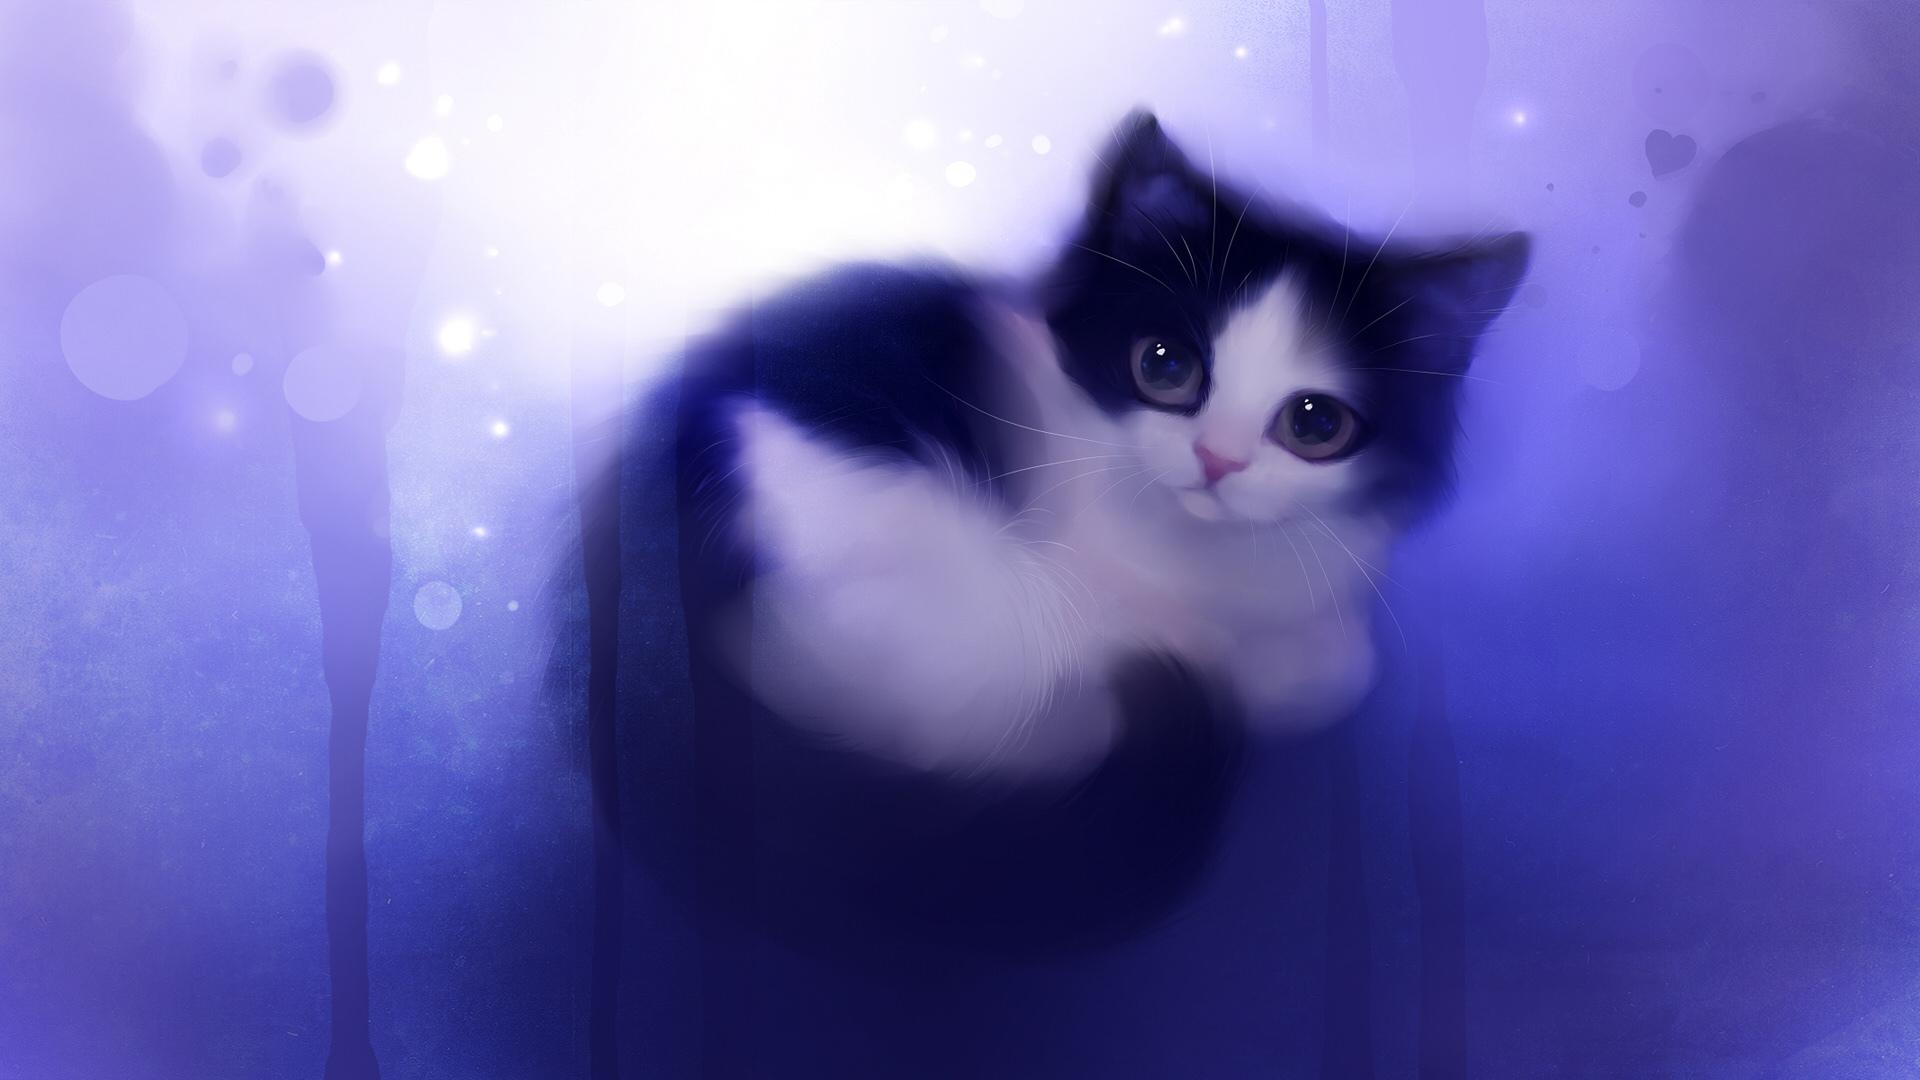 котенок взгляд милый kitten view cute загрузить